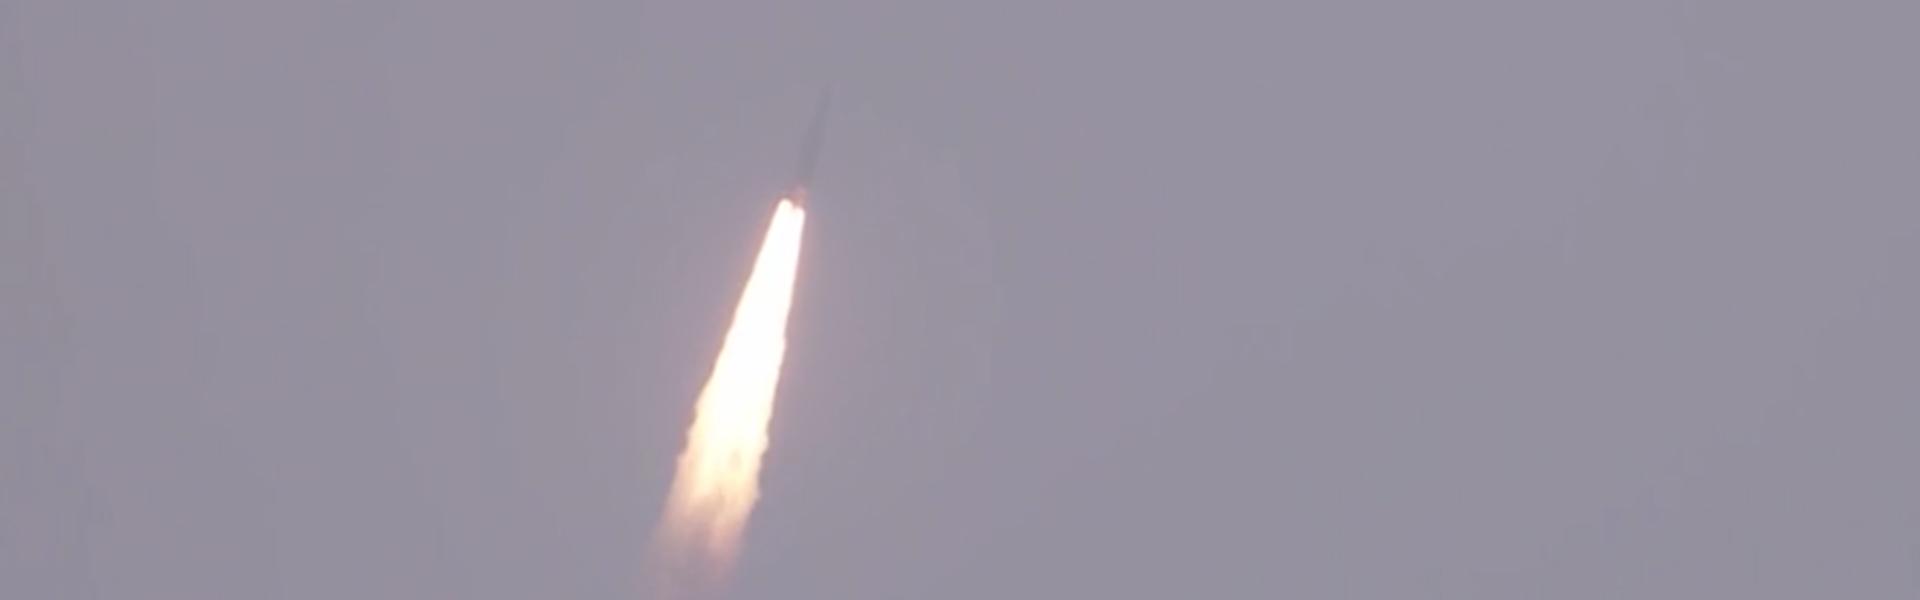 Congratulations to EU/ESA/GSA on Successful Launch of 4 New Galileo Satellites